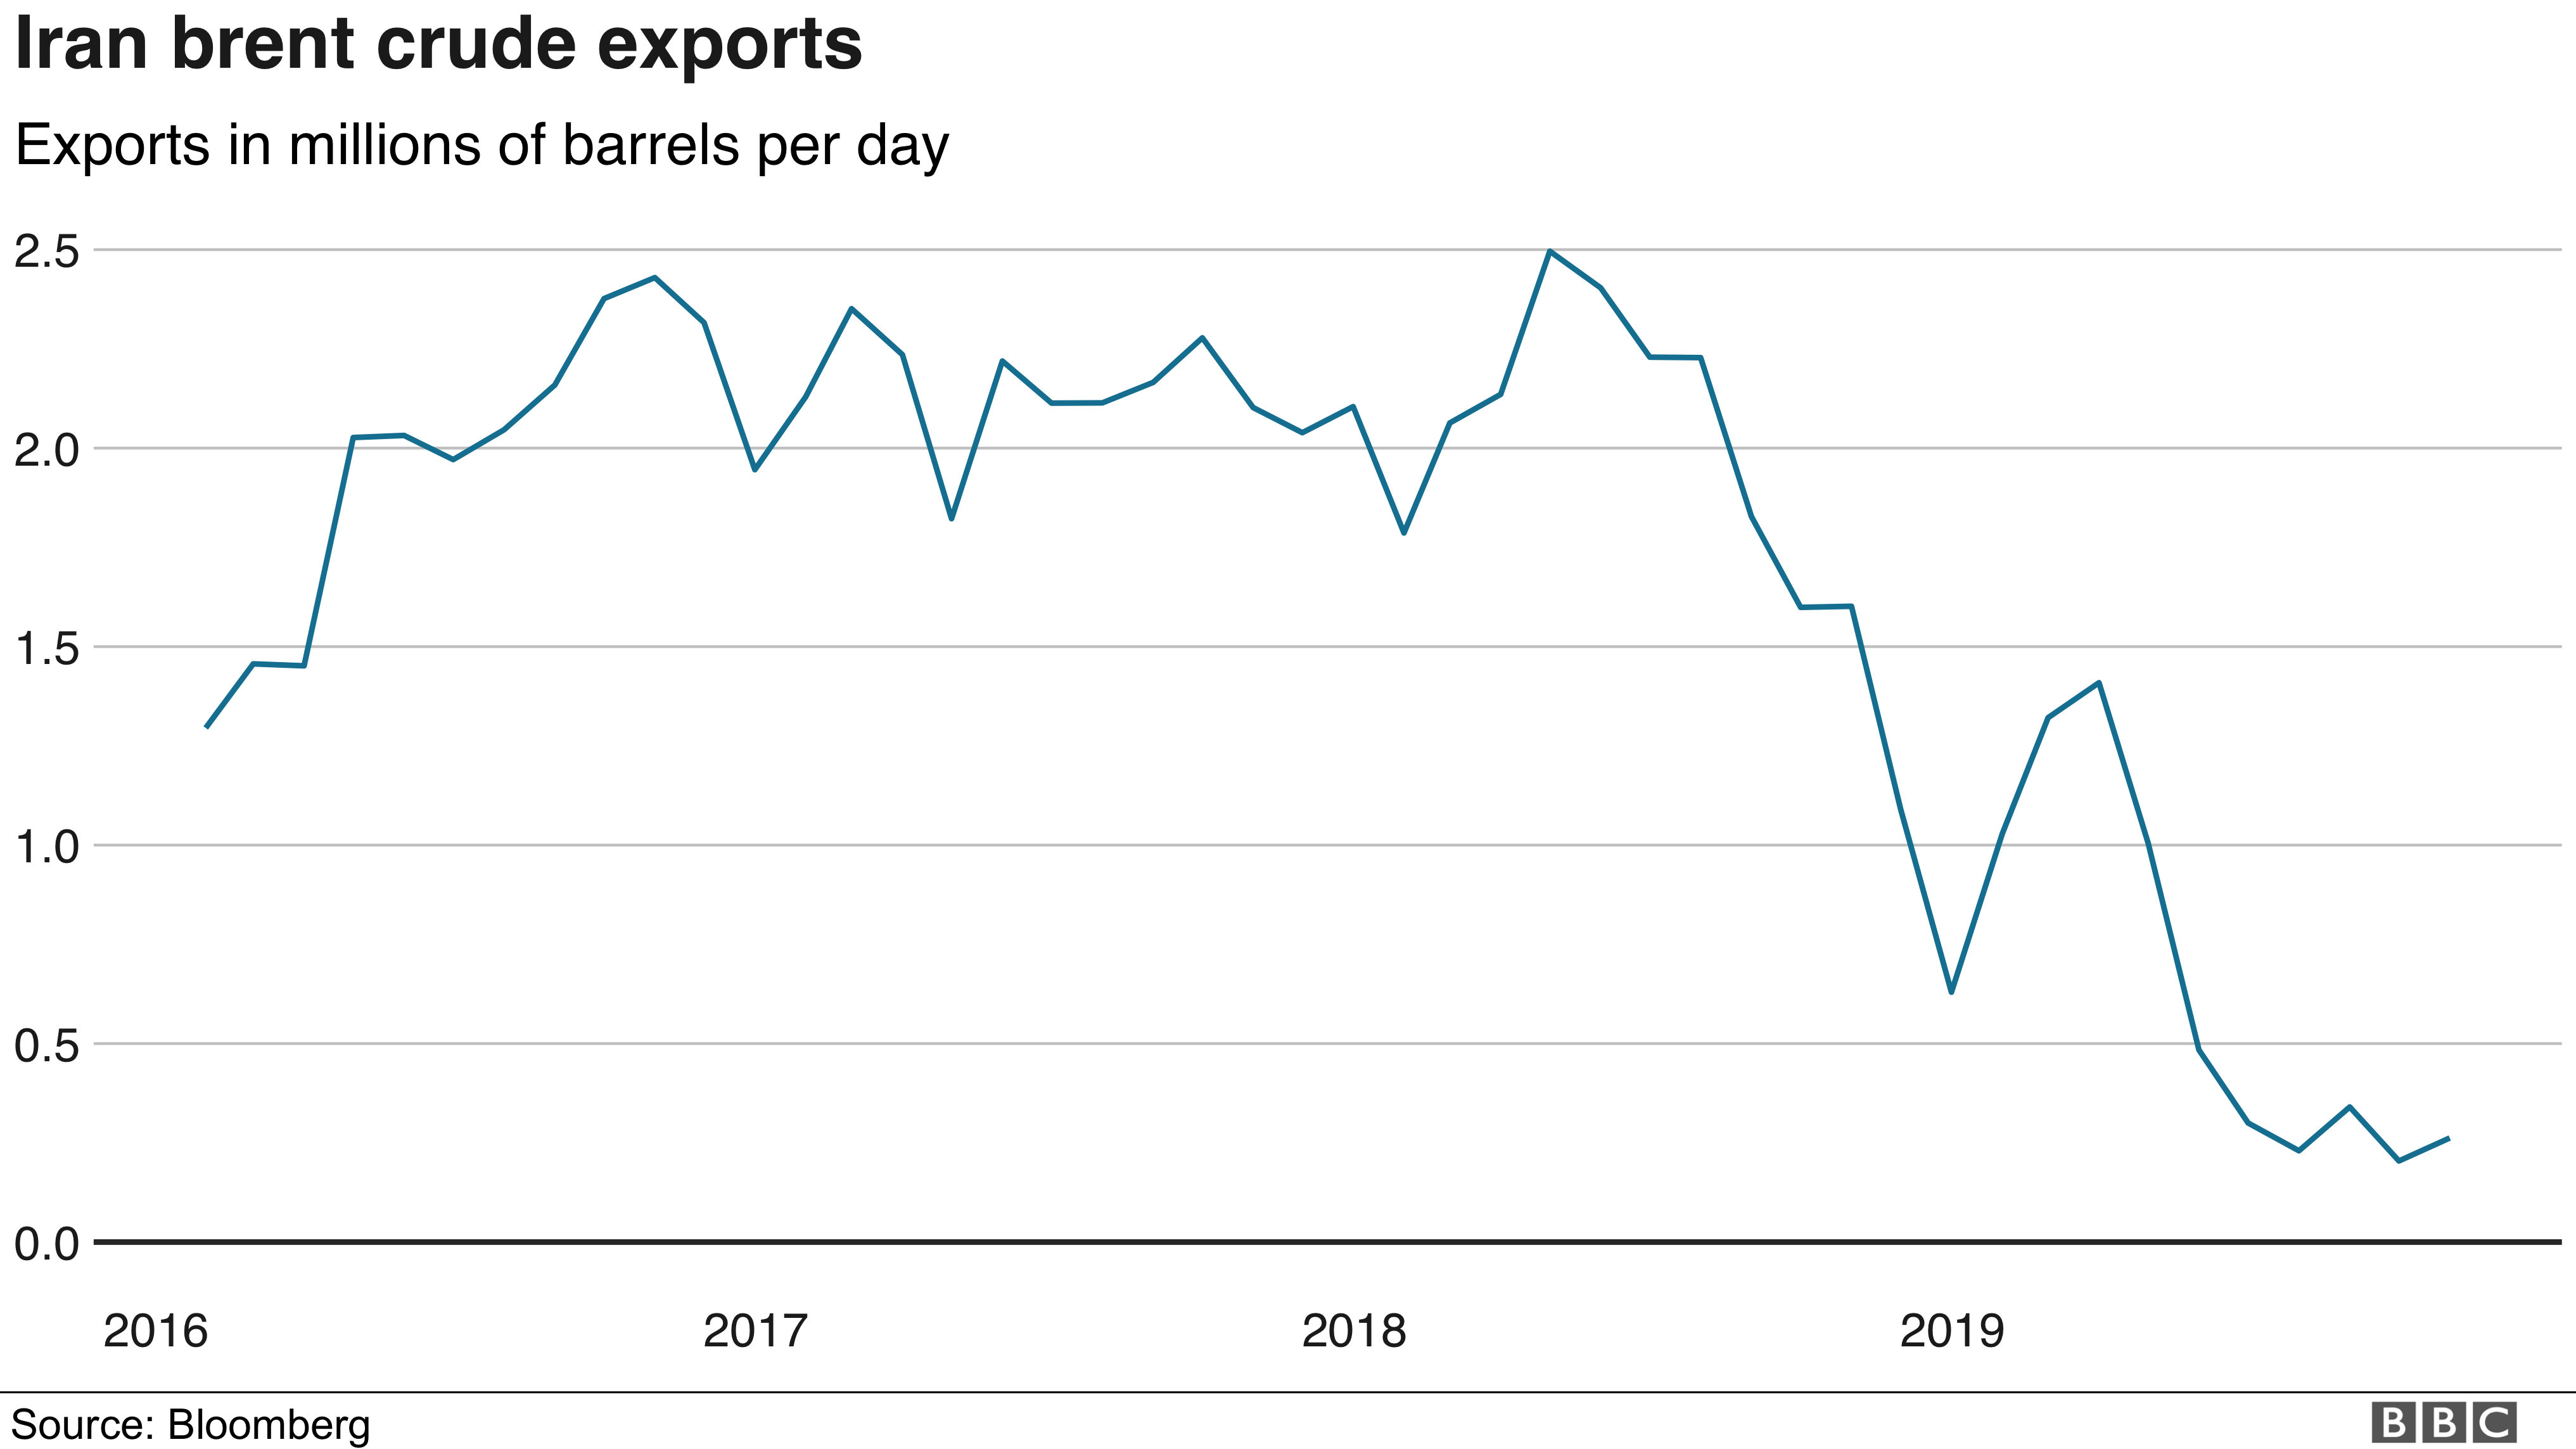 Iran brent crude exports (November 2019)